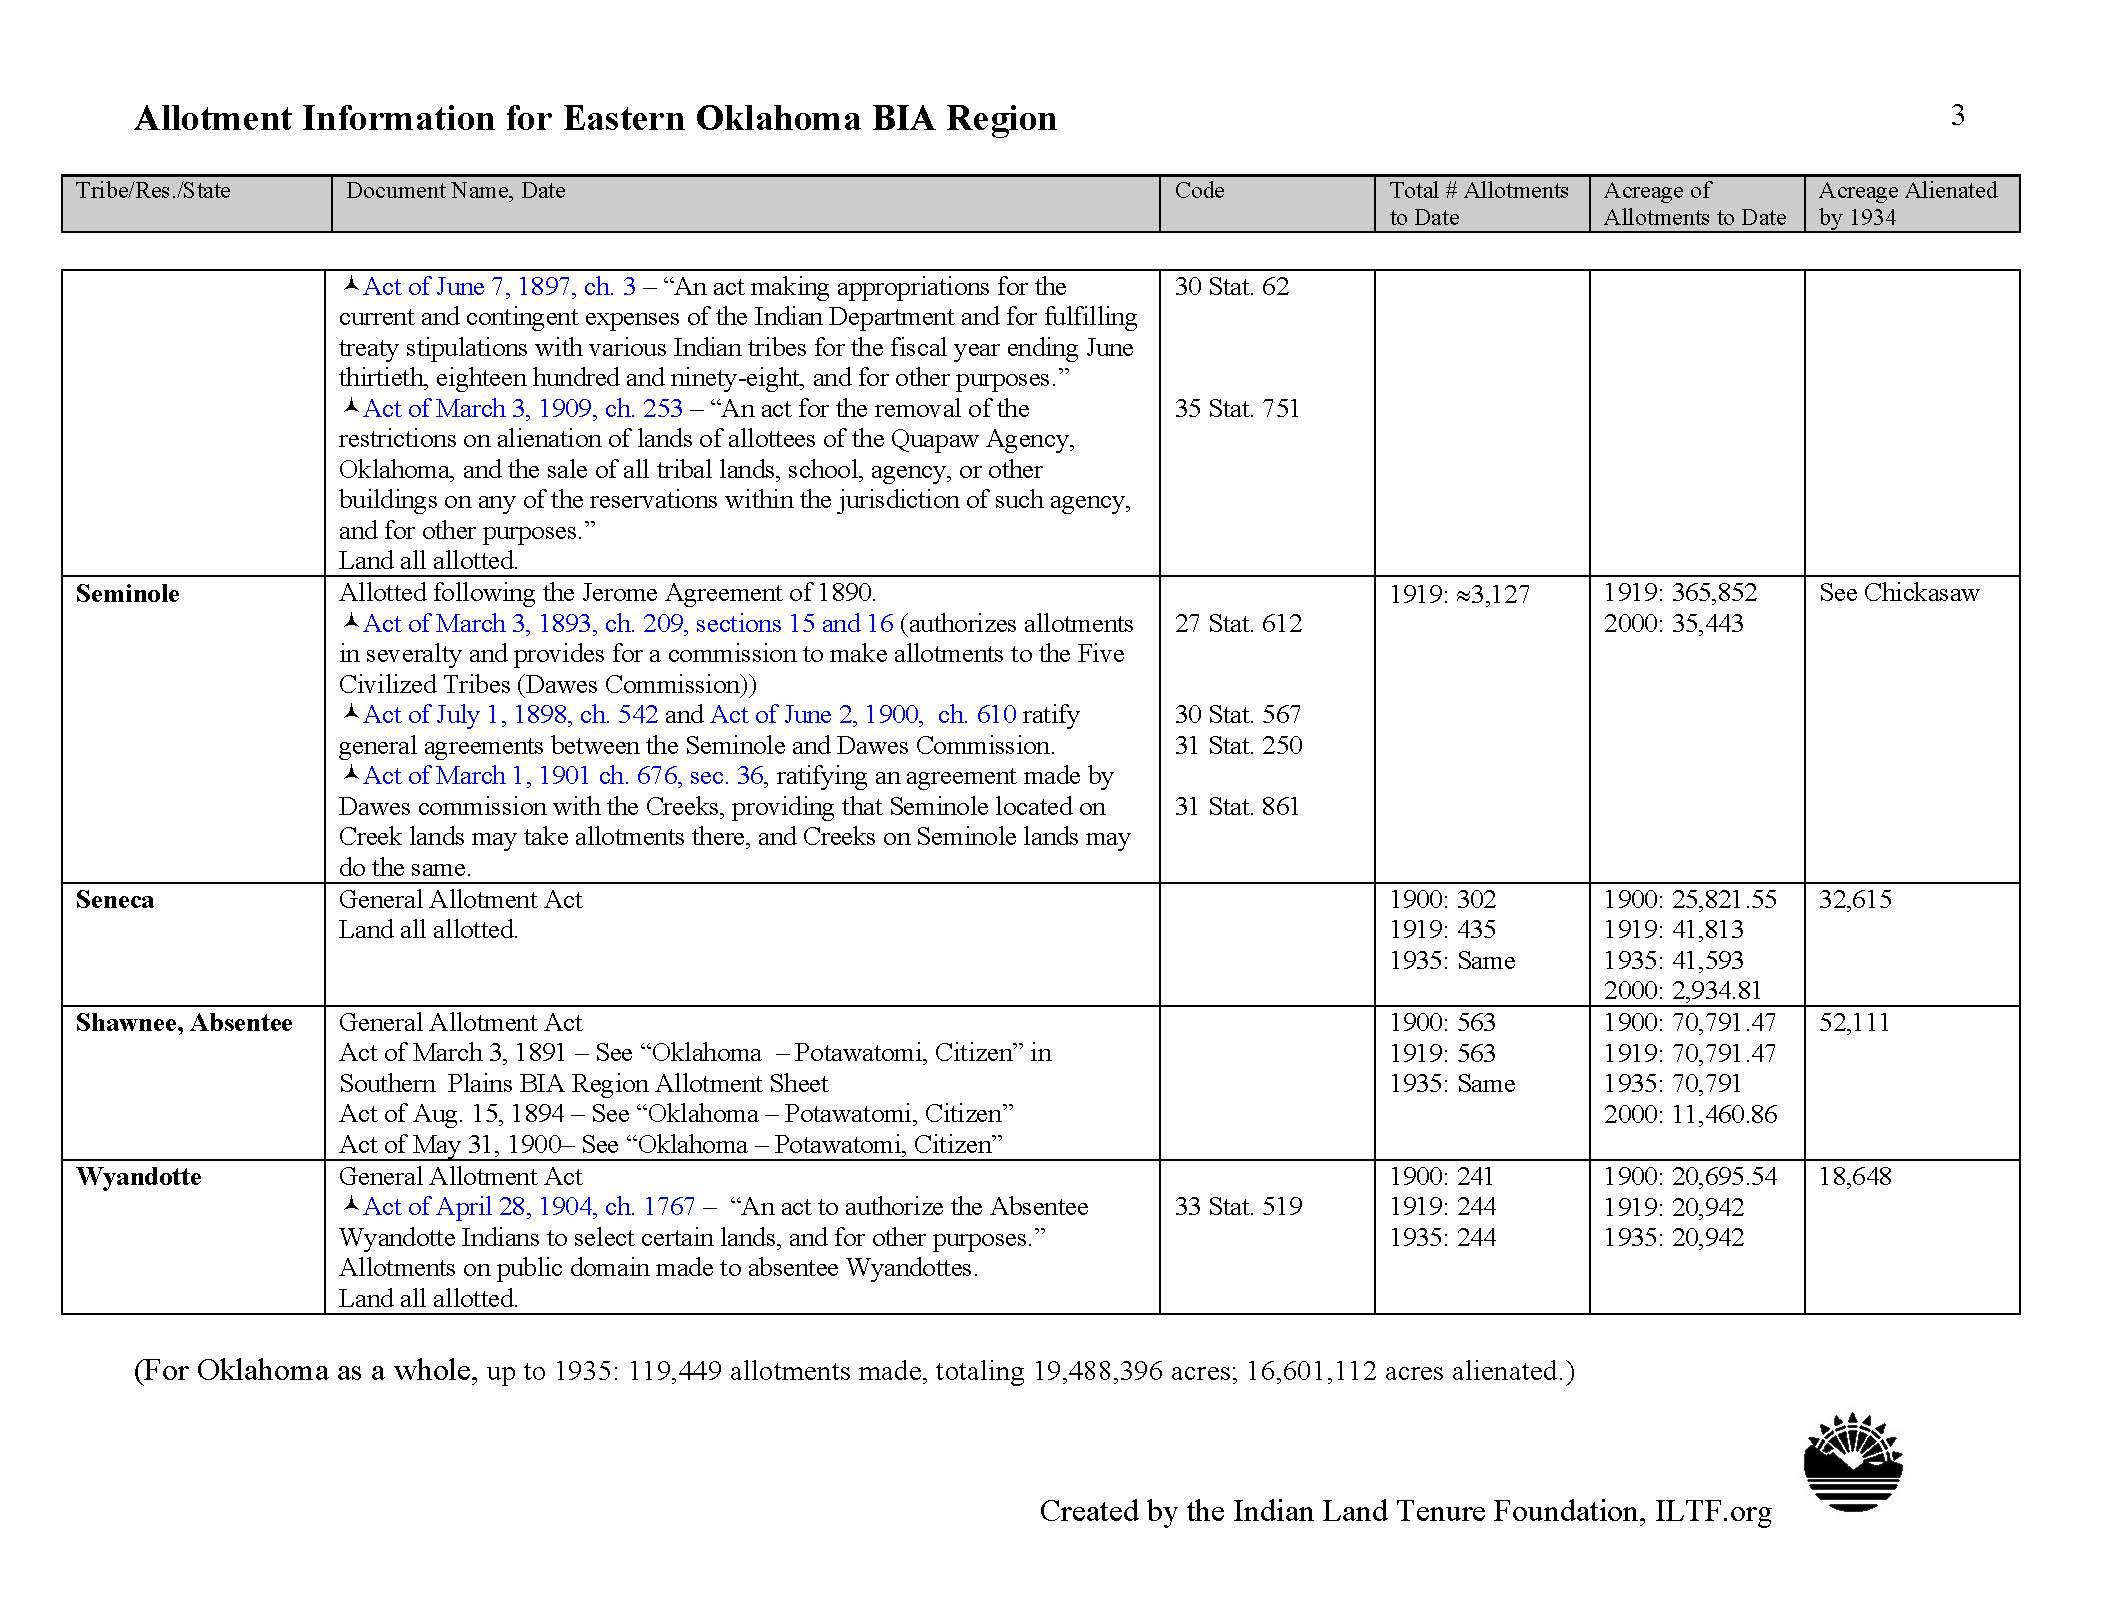 eastern_oklahoma_page_3